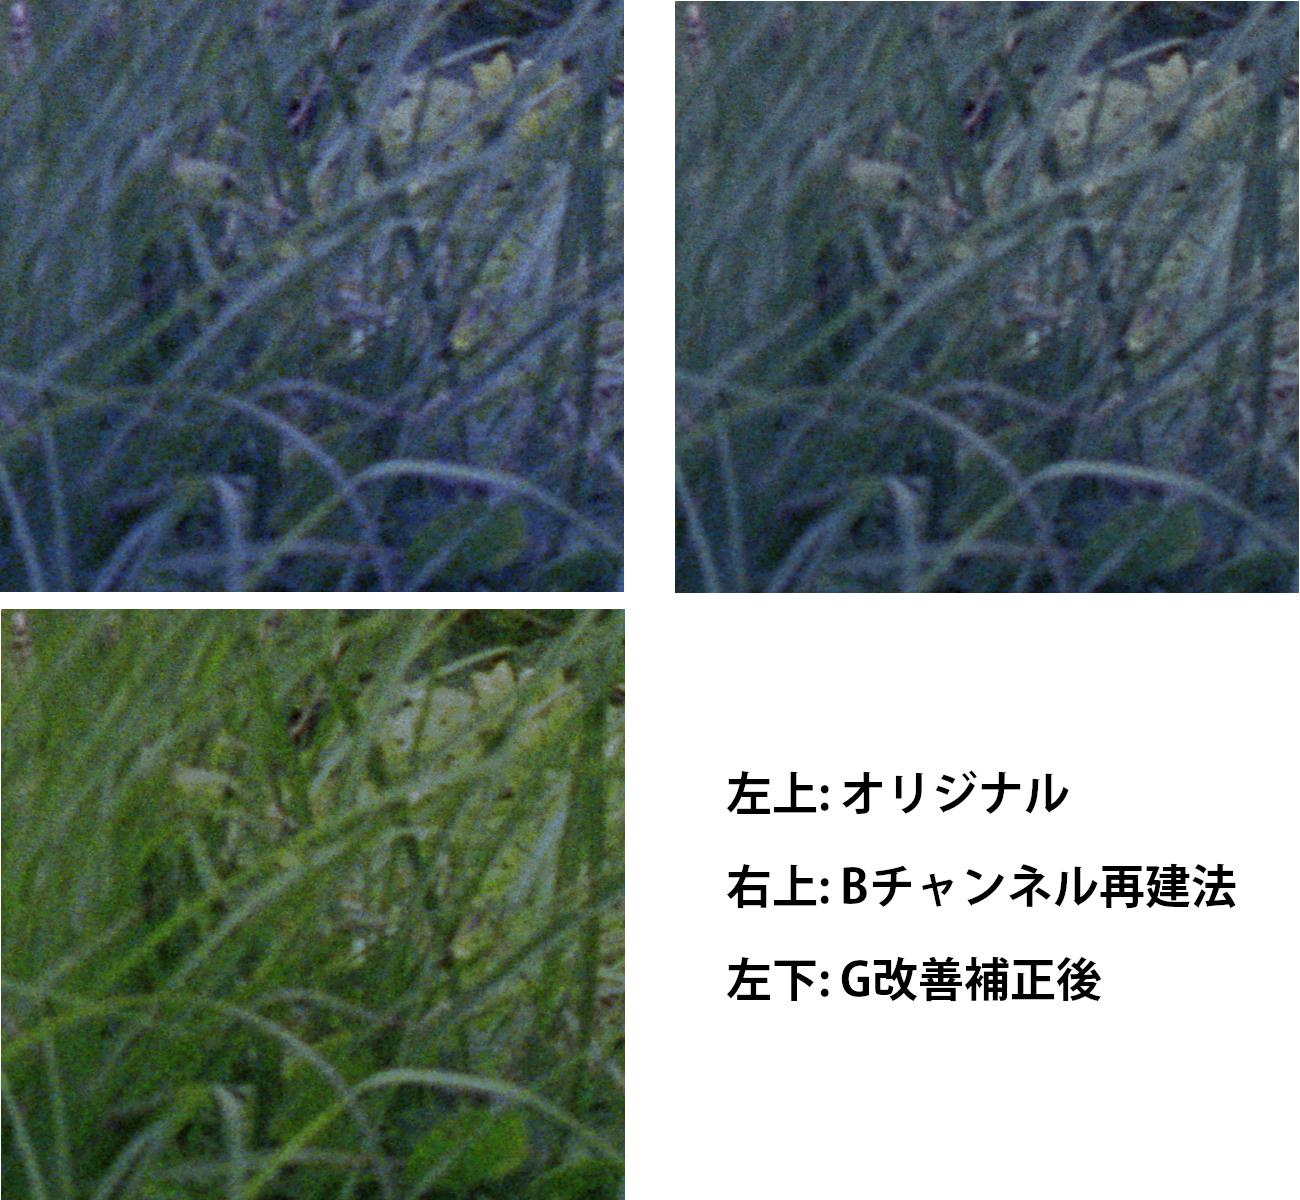 f:id:yasuo_ssi:20210524072538p:plain